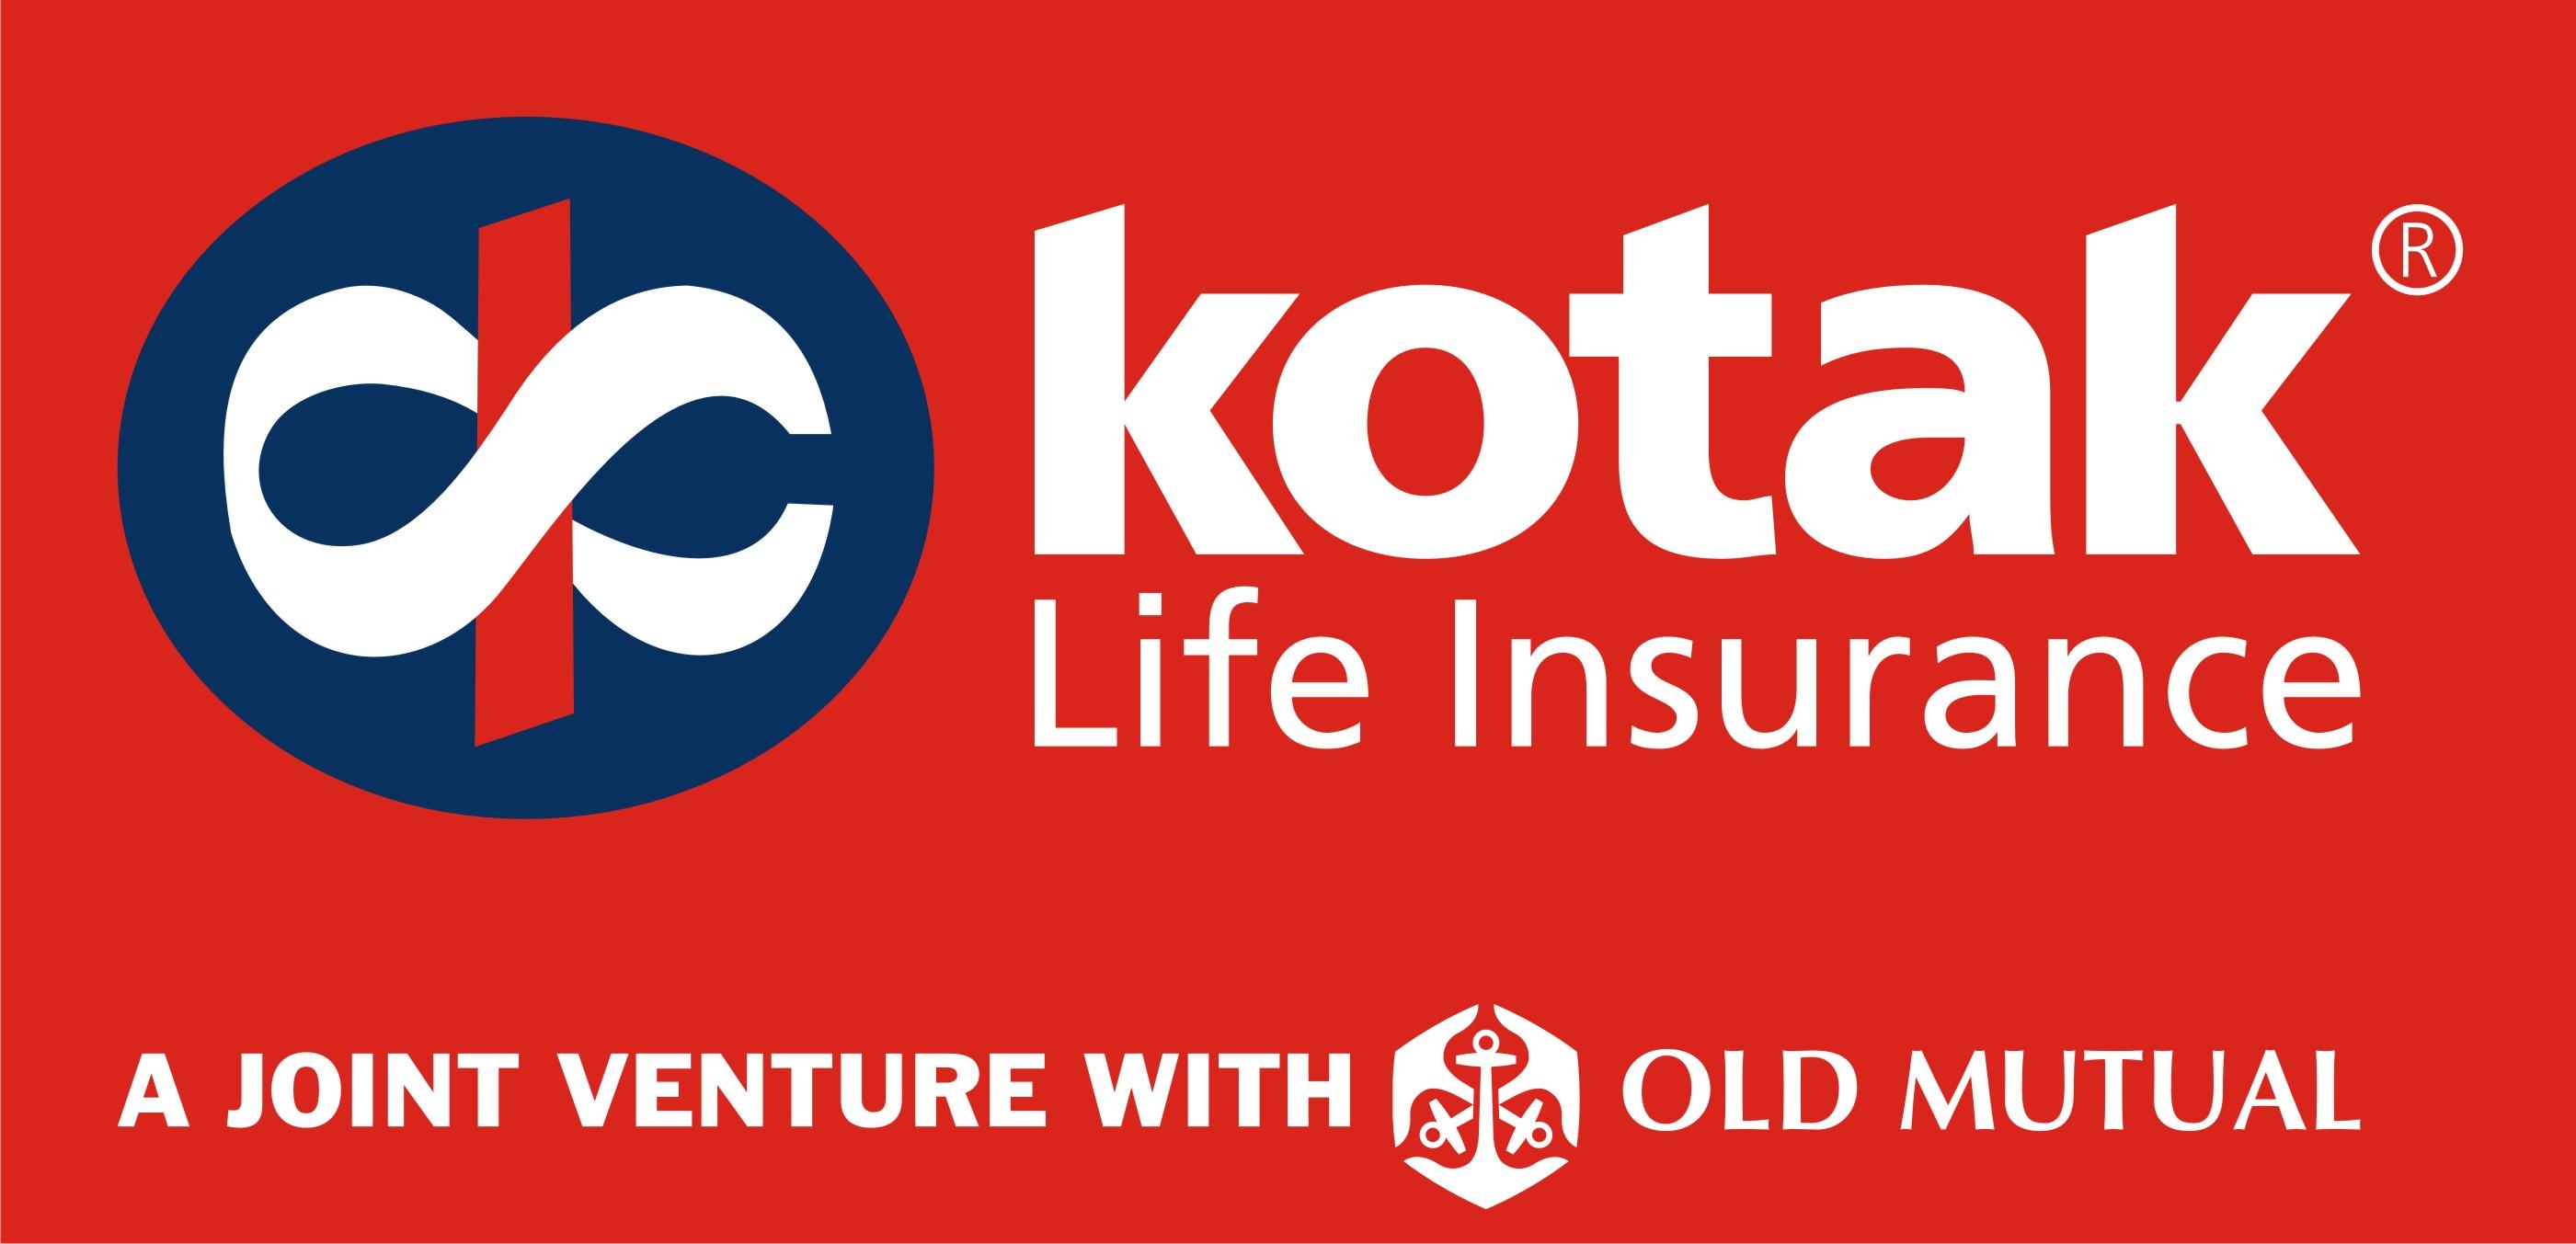 Kotak Life Insurance Customer Care Number, Email Address ...